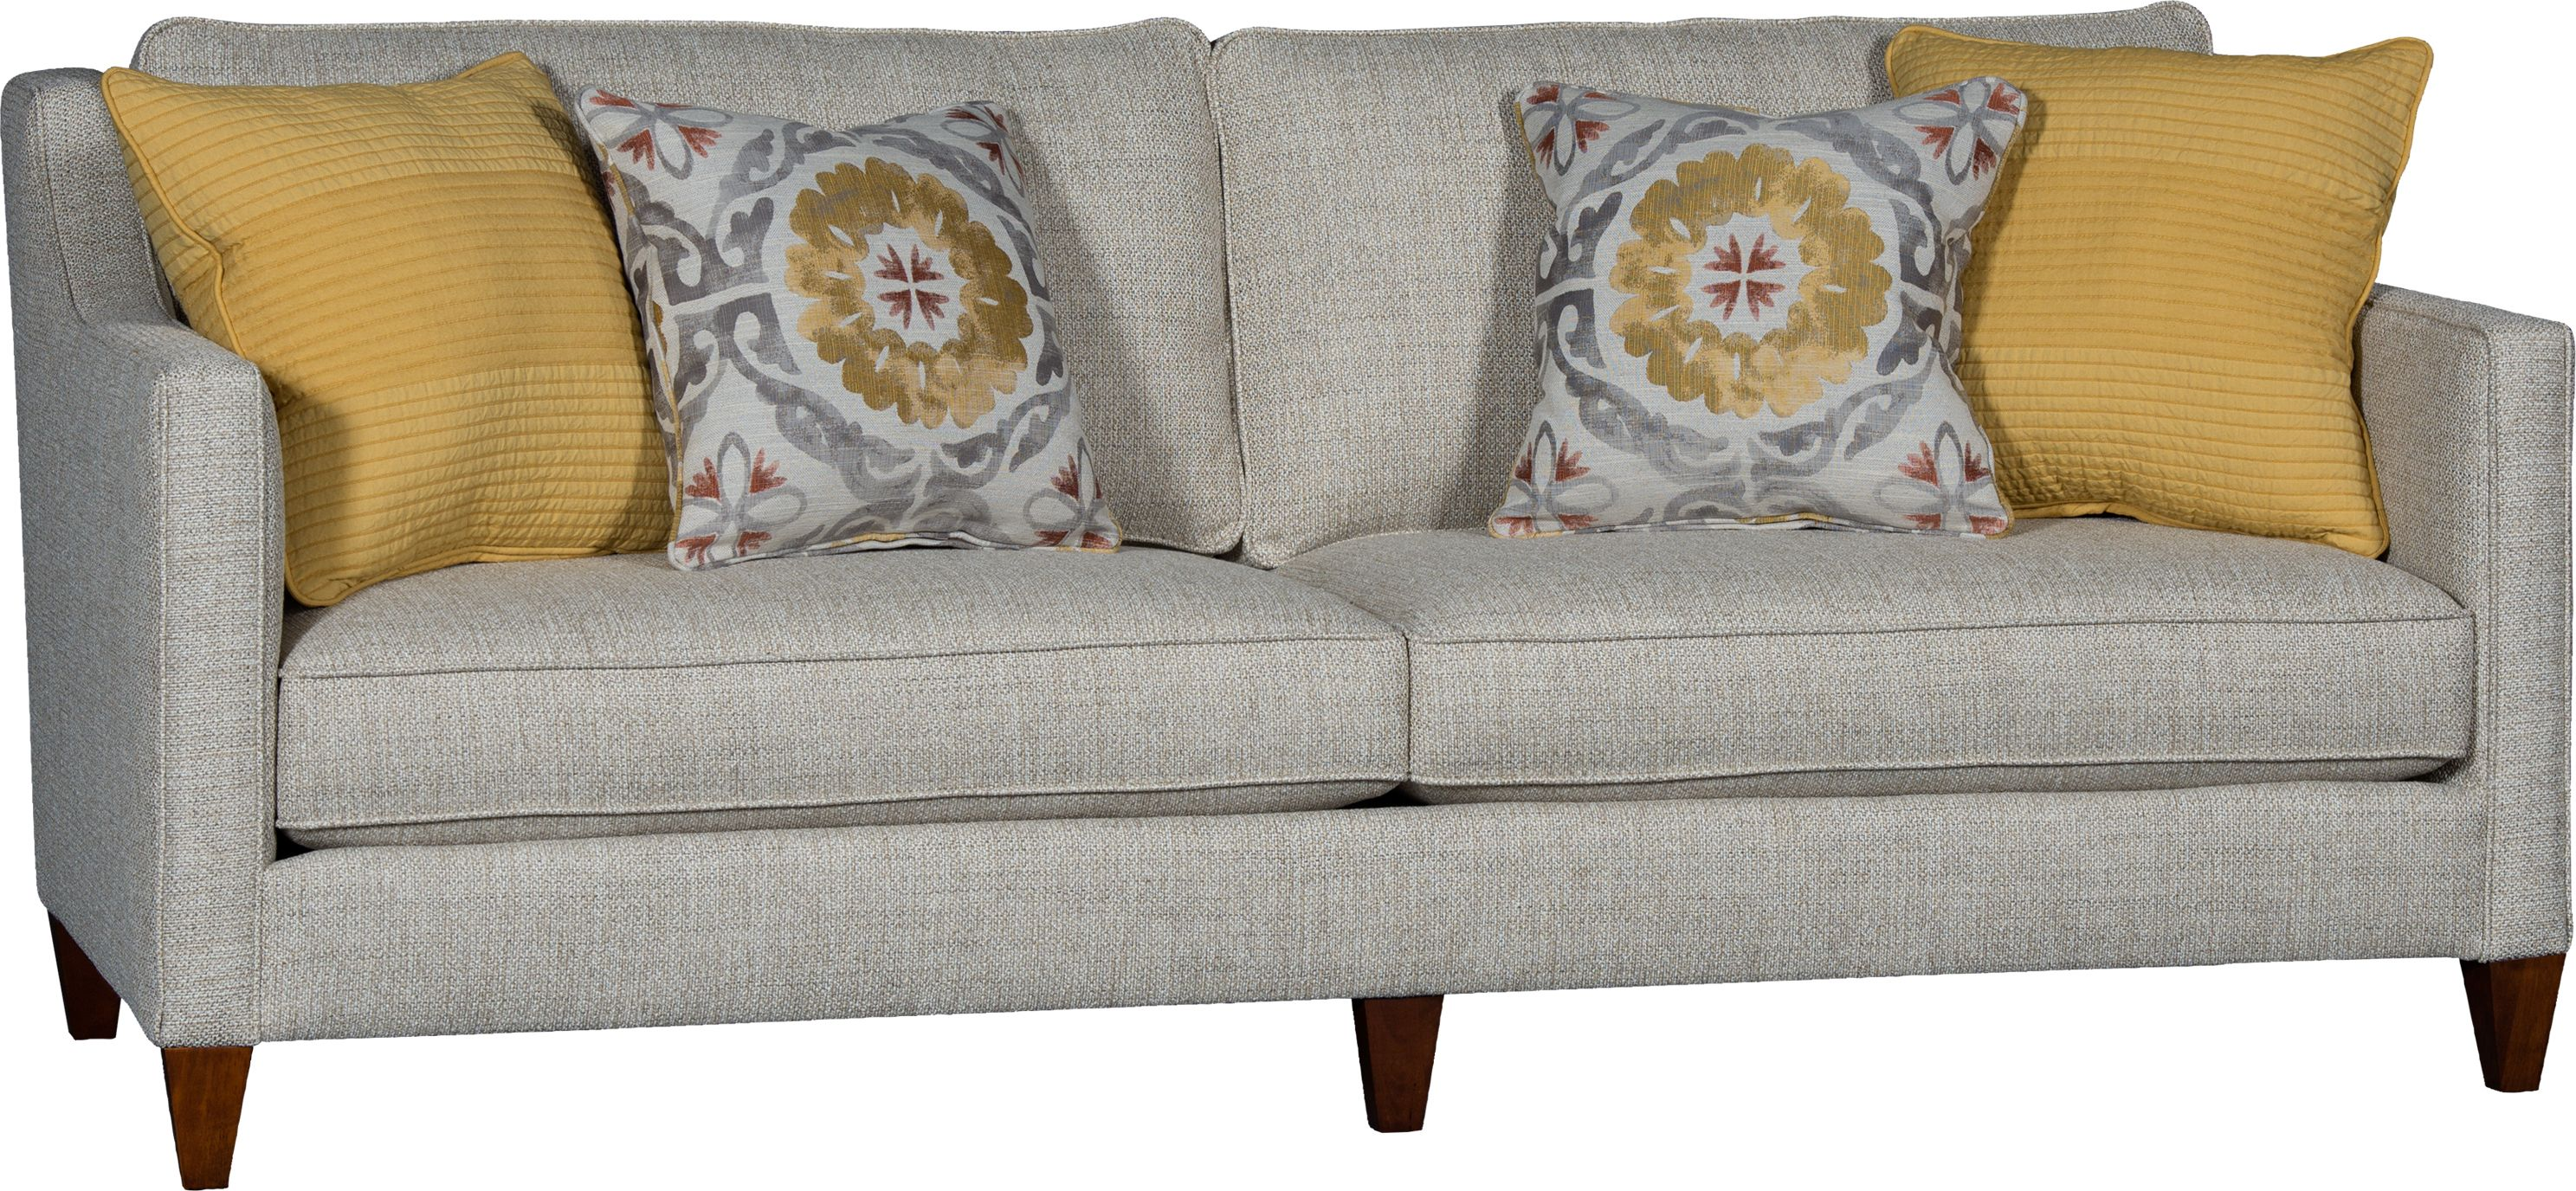 My new sofa Mayo 4300 sofa Kurtz Linen